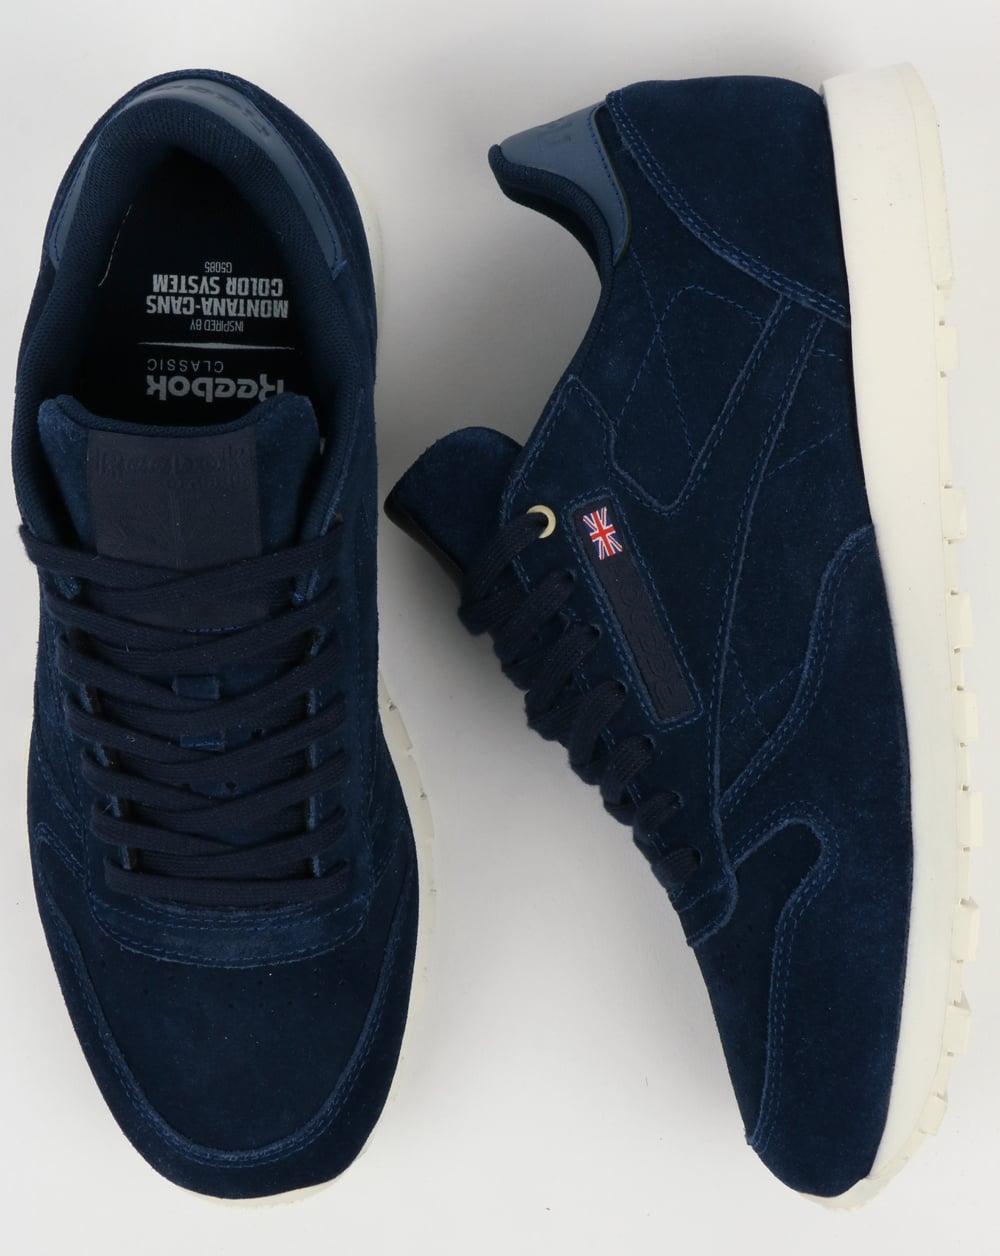 online store 86f3e b7438 ... authentic reebok classic leather mcc trainers blue note chalk 7ce3d  8bfa7